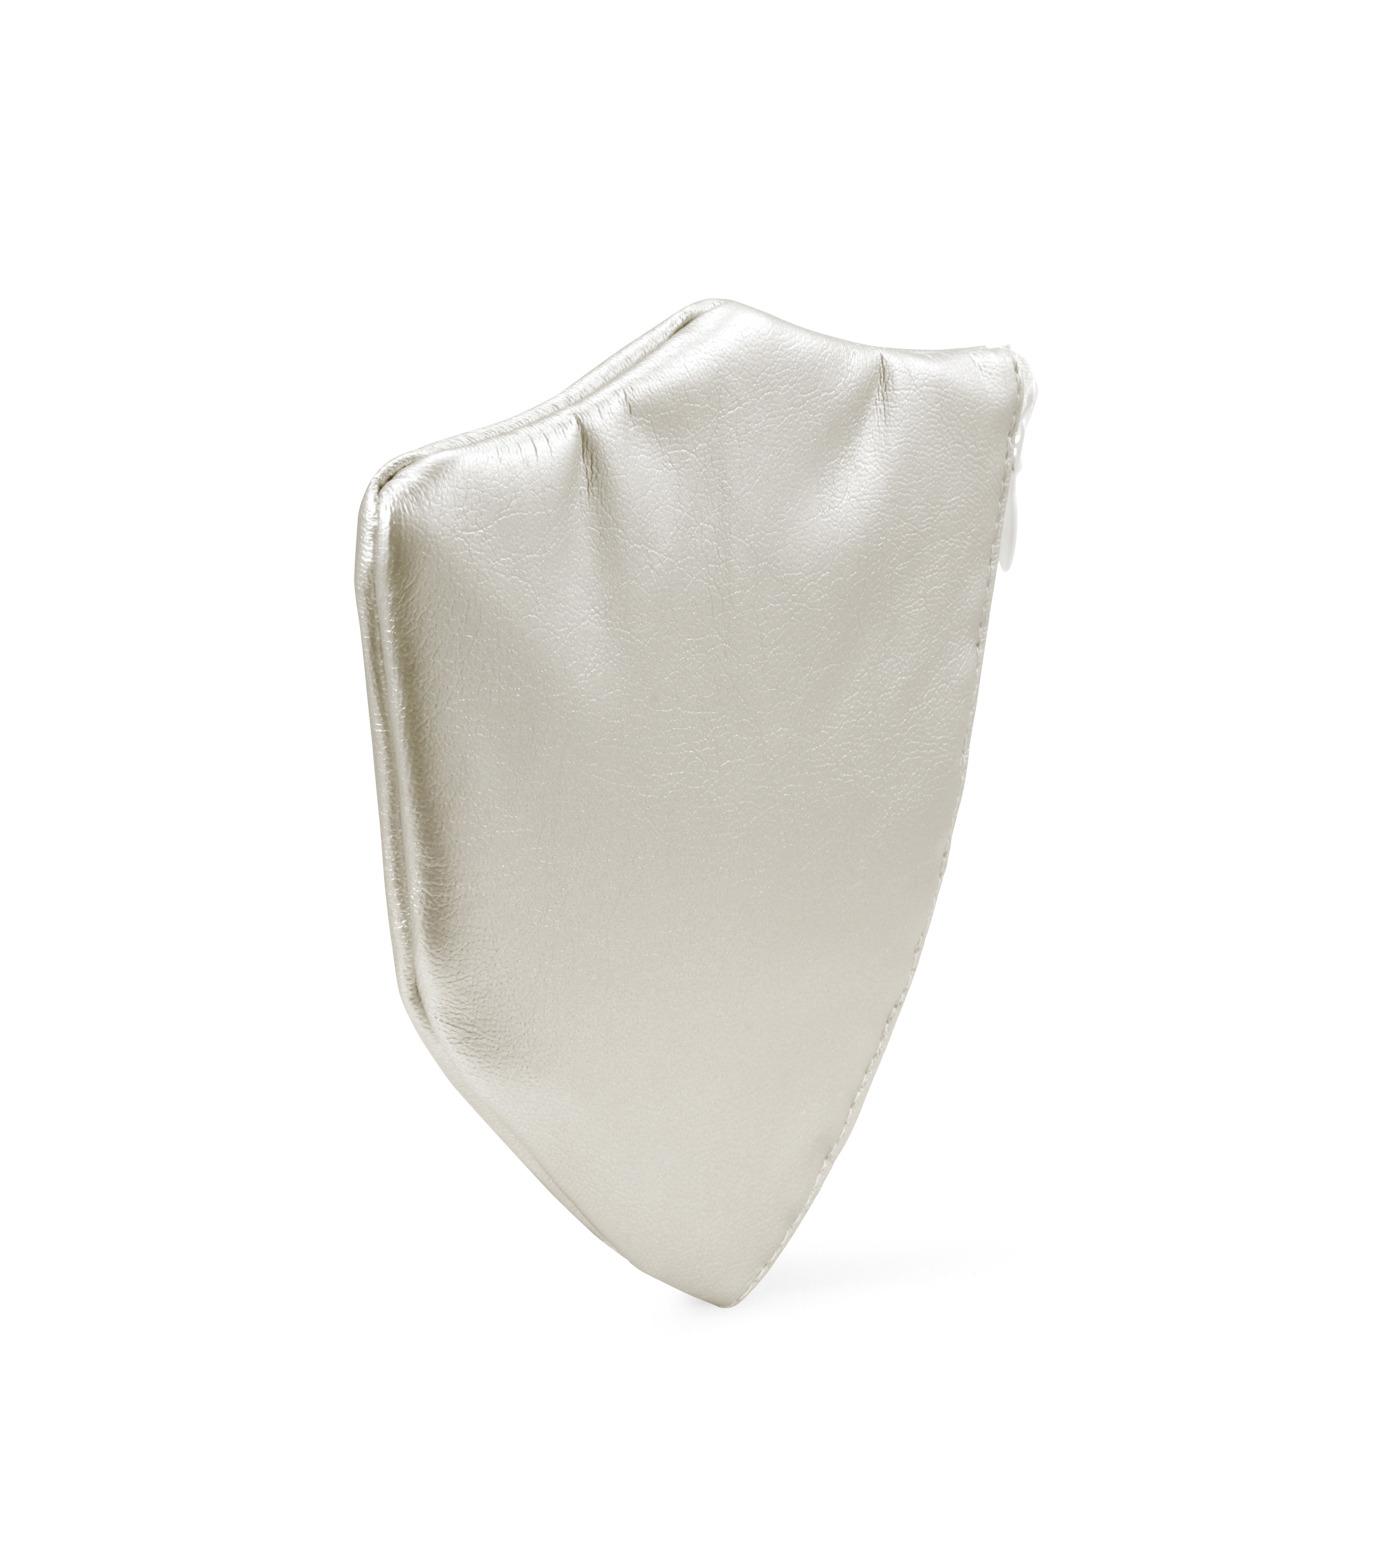 Phenomenon(フェノメノン)のLeather emblem pouch-SILVER(デジタルアクセサリー/digital accesary)-ILLBG-135-1 拡大詳細画像2